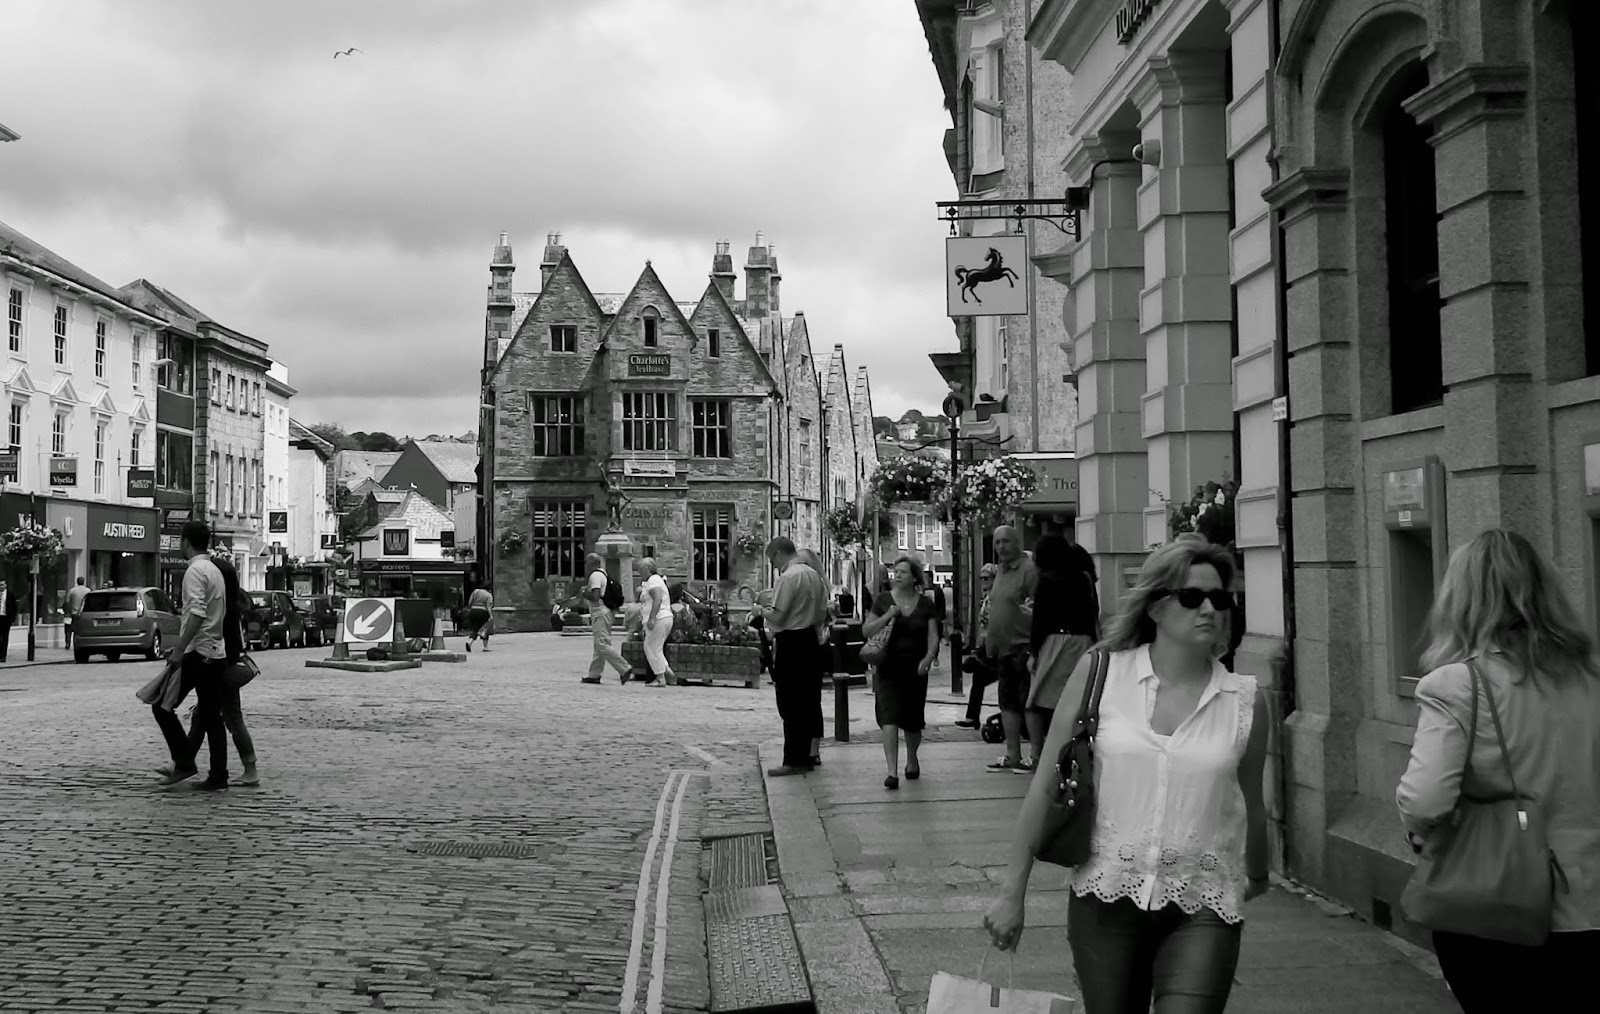 Boscawen Street, Truro, Cornwall